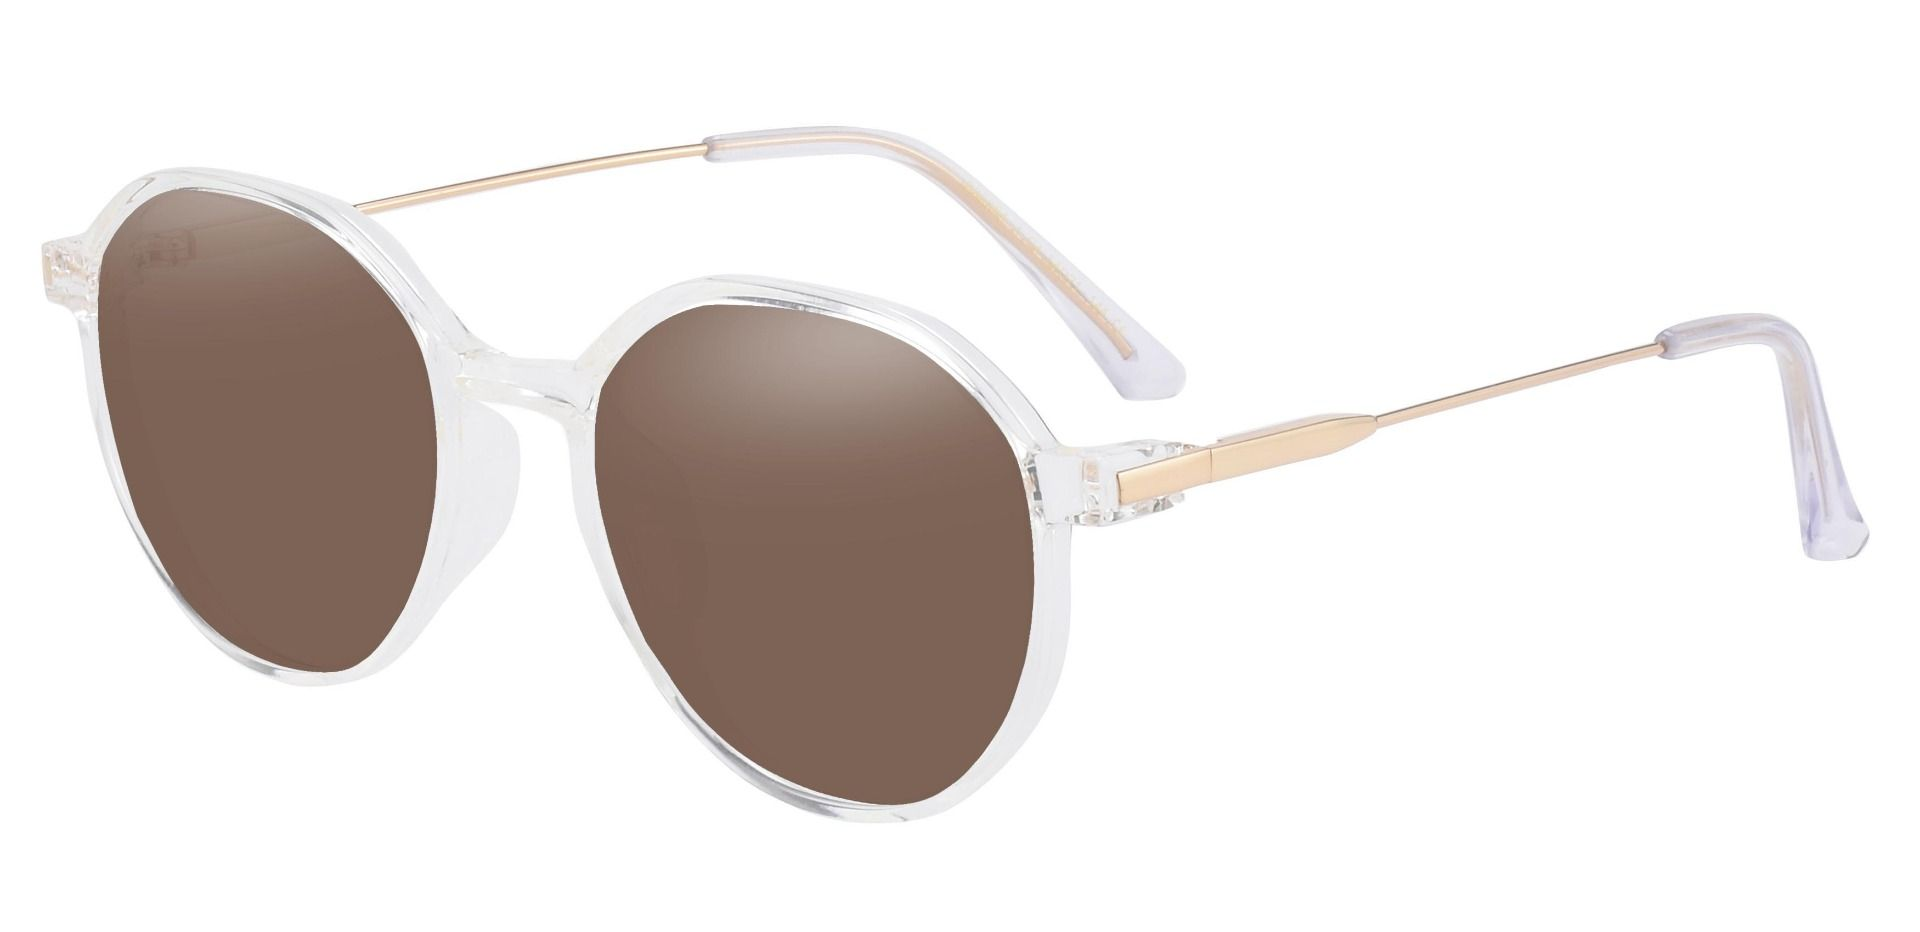 Daytona Geometric Reading Sunglasses - Clear Frame With Brown Lenses